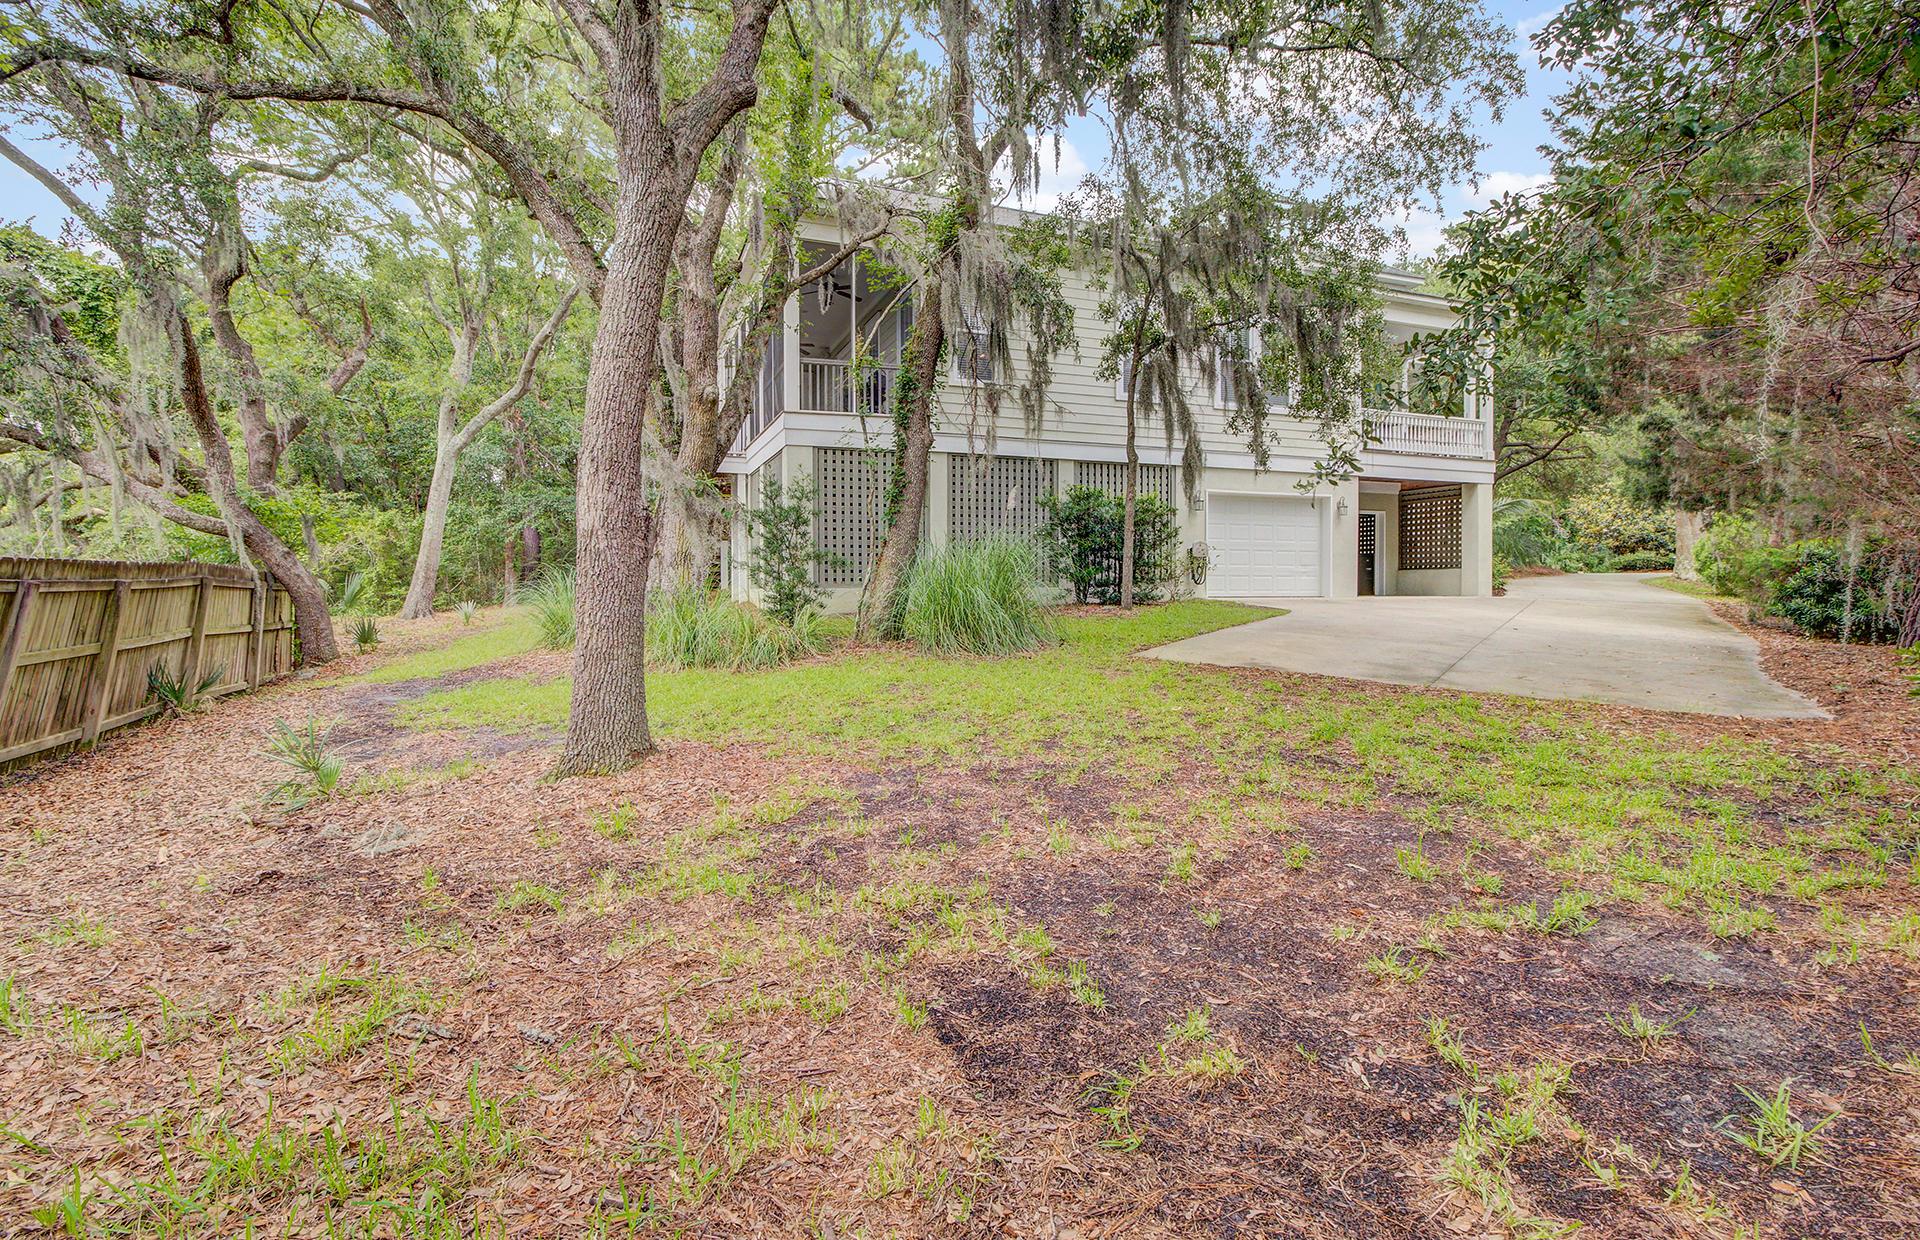 Rice Planters Pointe Homes For Sale - 521 Rice Planters, Mount Pleasant, SC - 43